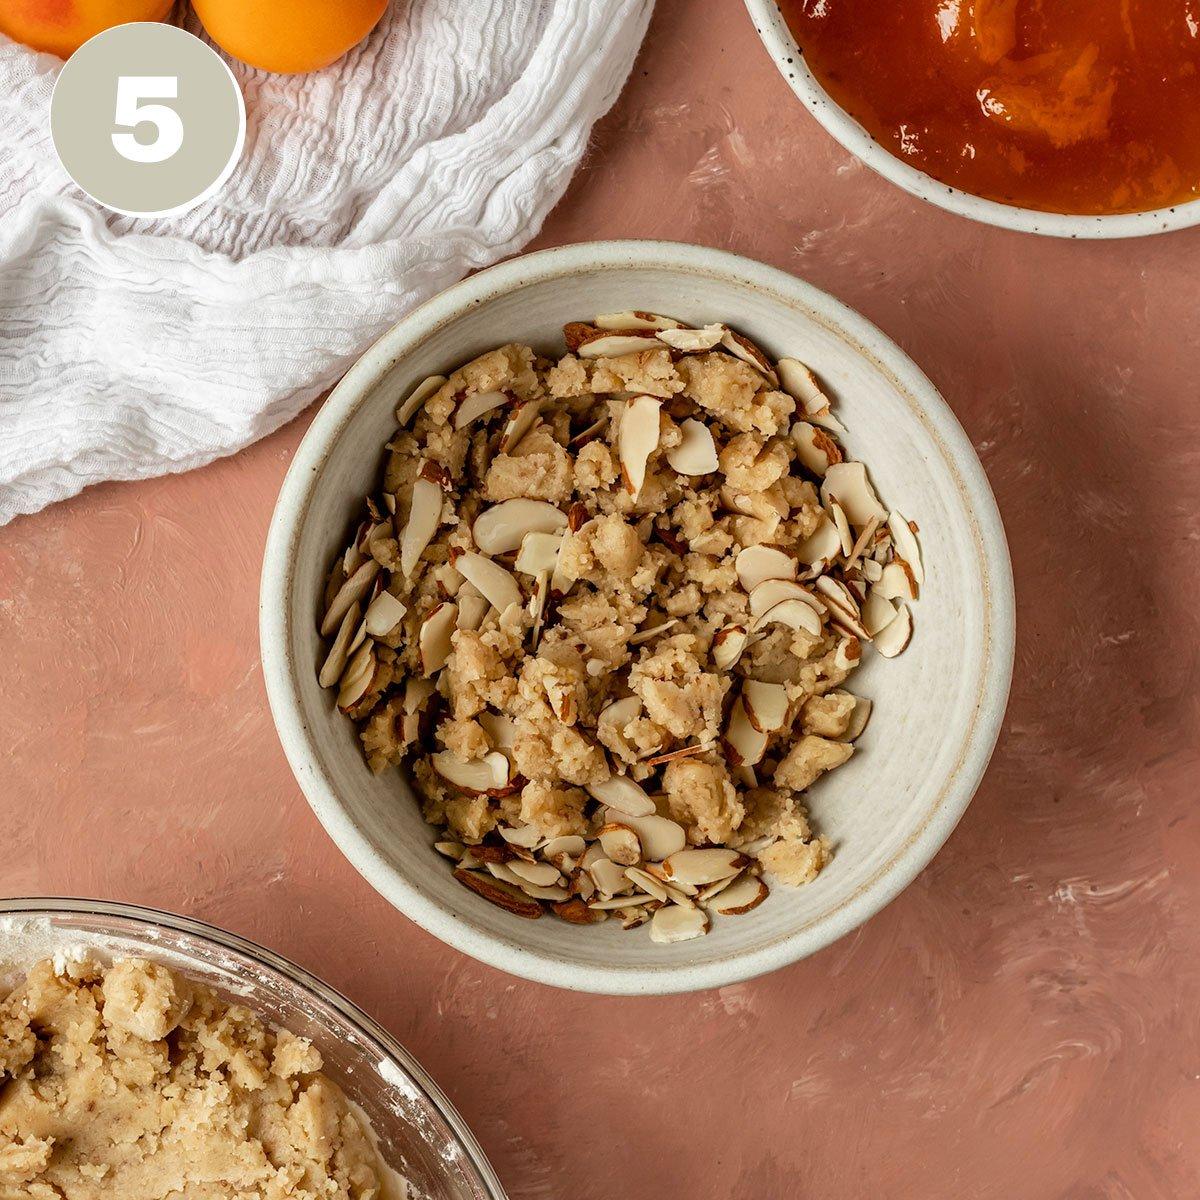 a bowl of a shortbread almond crumble